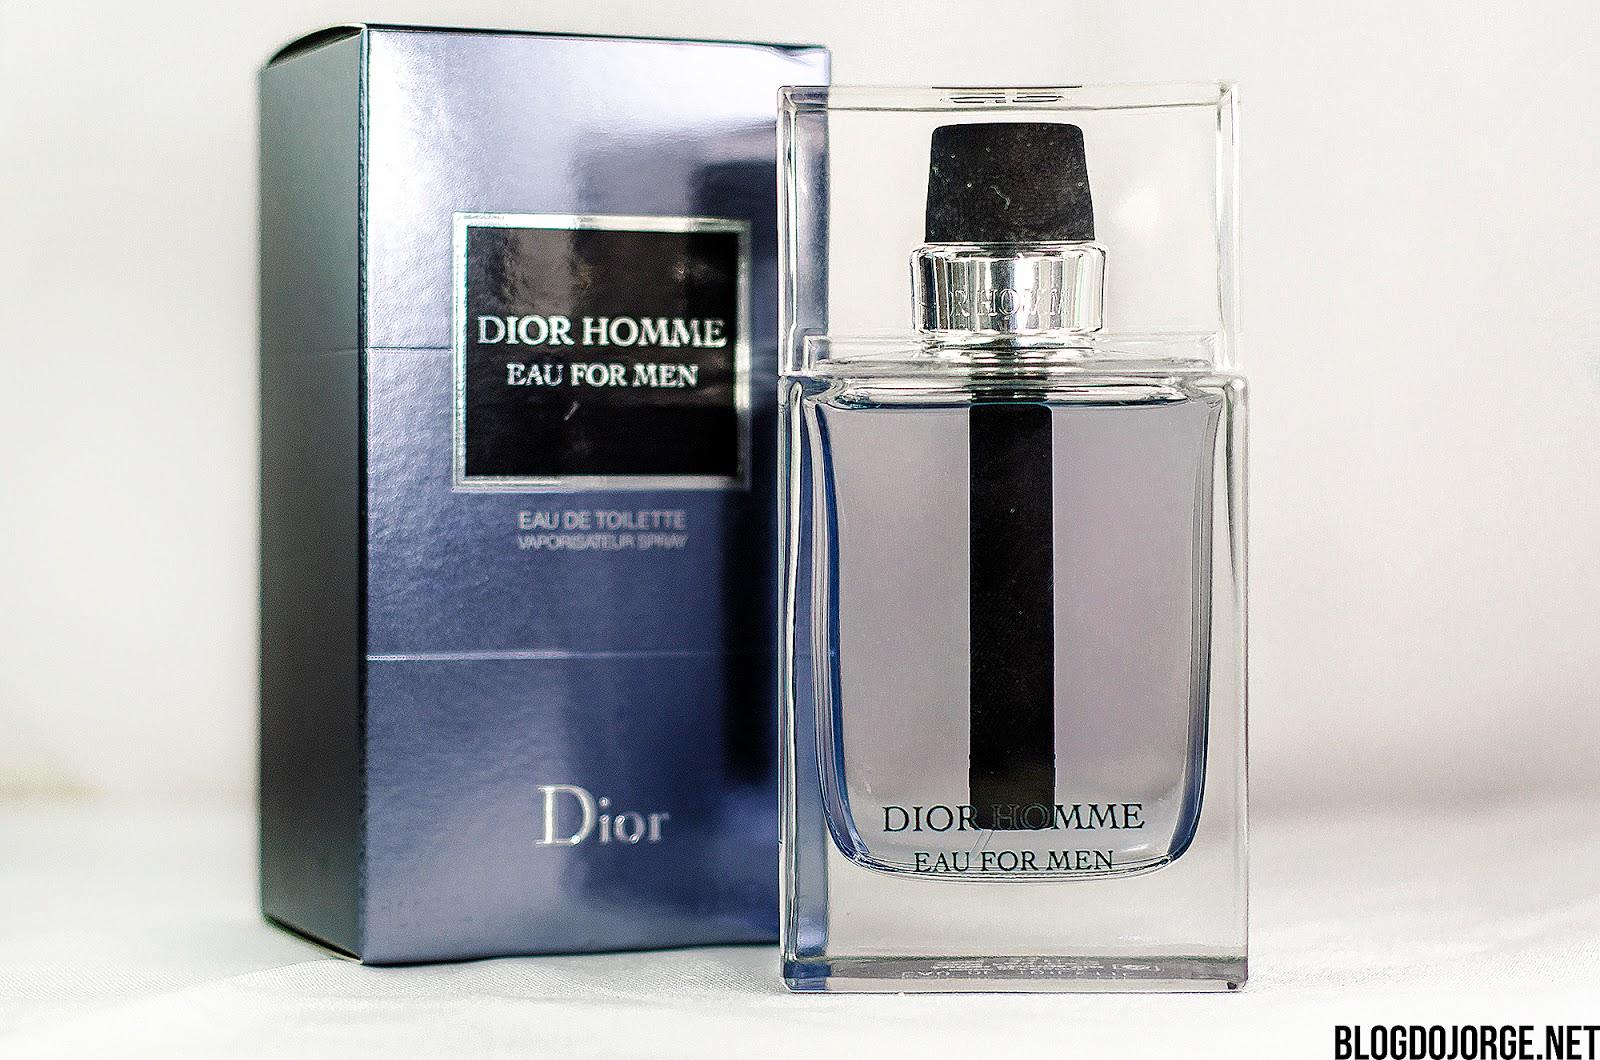 Resenha Dior Homme Eau for Men